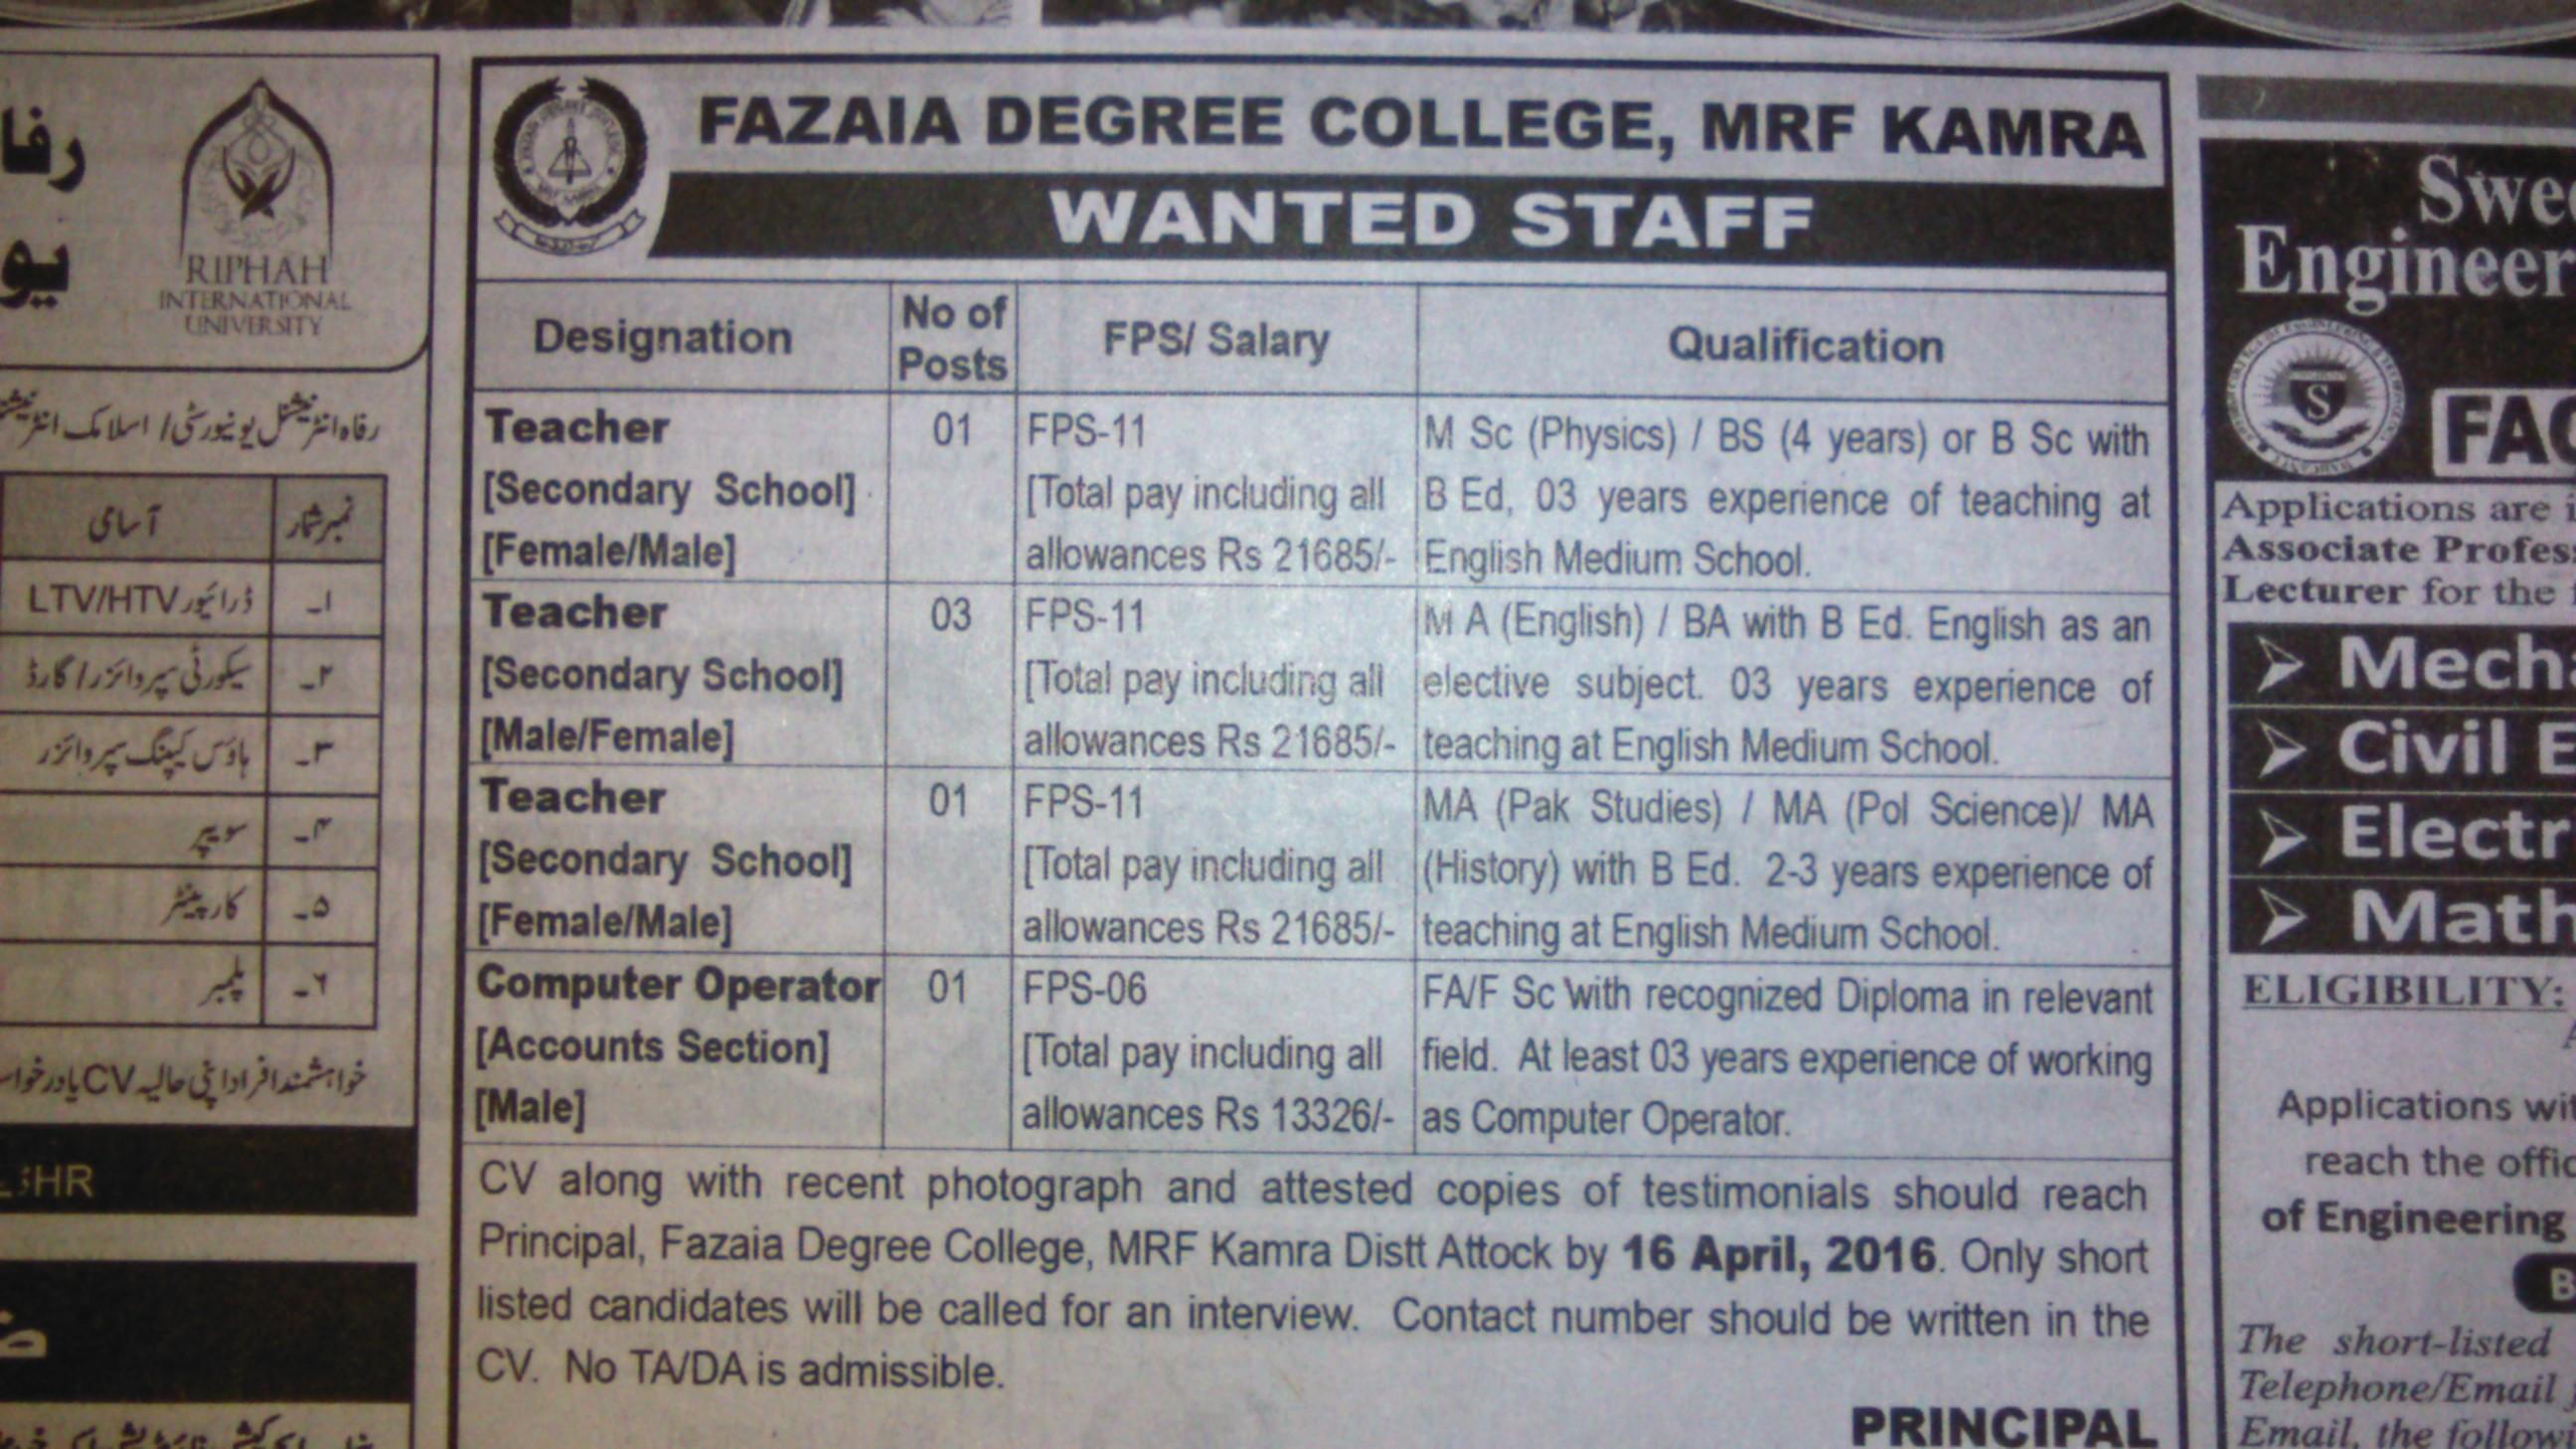 Fazia Degree College MRF Kamra Jobs 2016